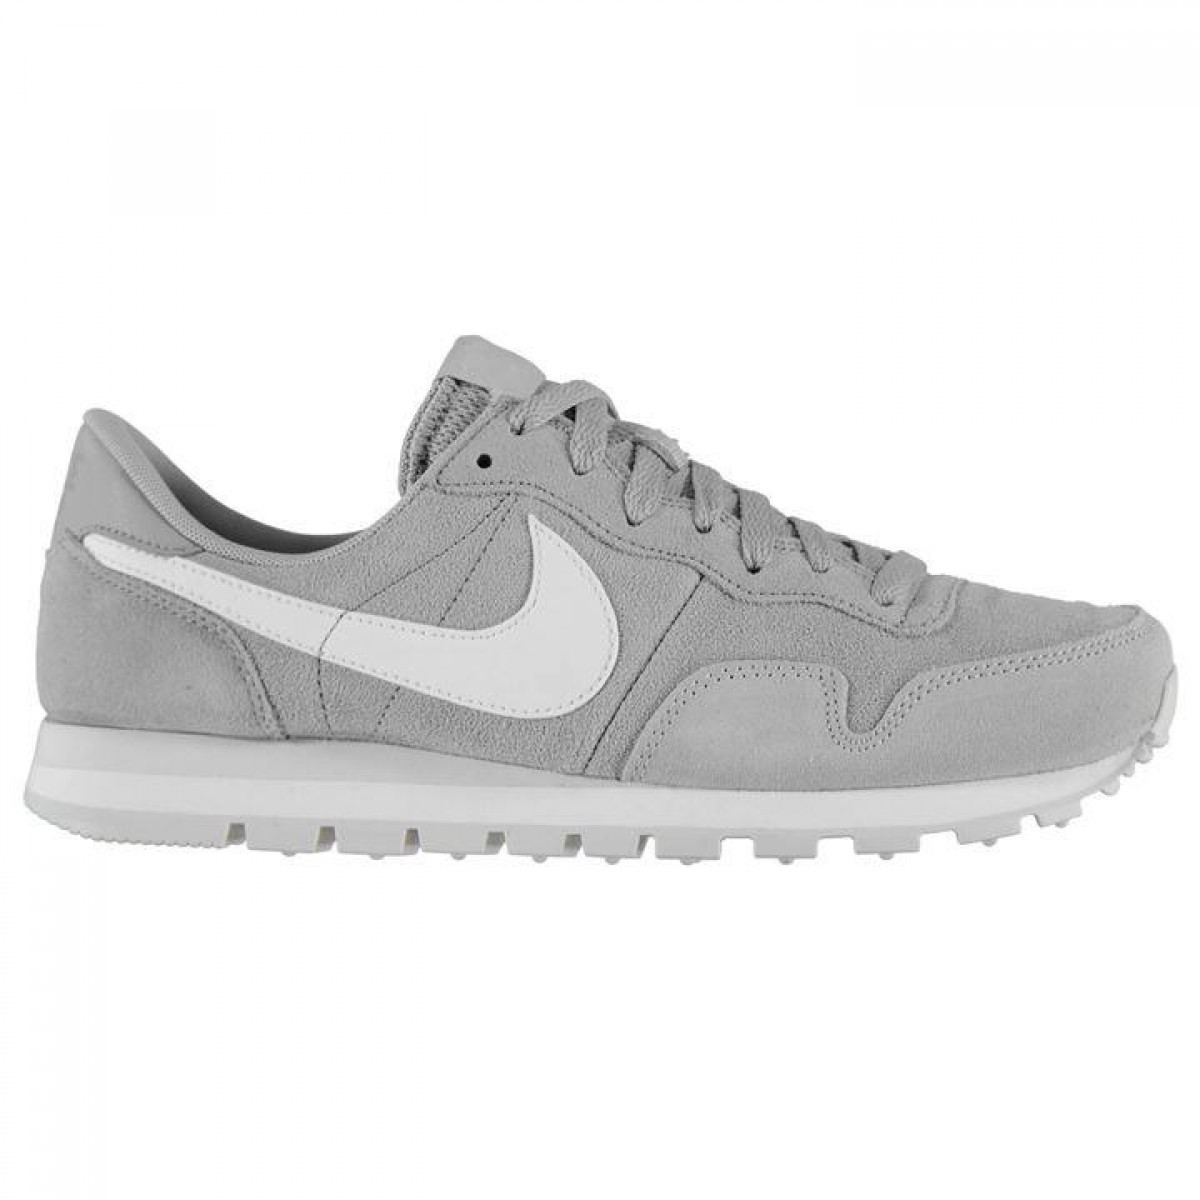 Кроссовки Nike Air Pegasus 83 Grey White - Оригинал 16df3801f0ca7